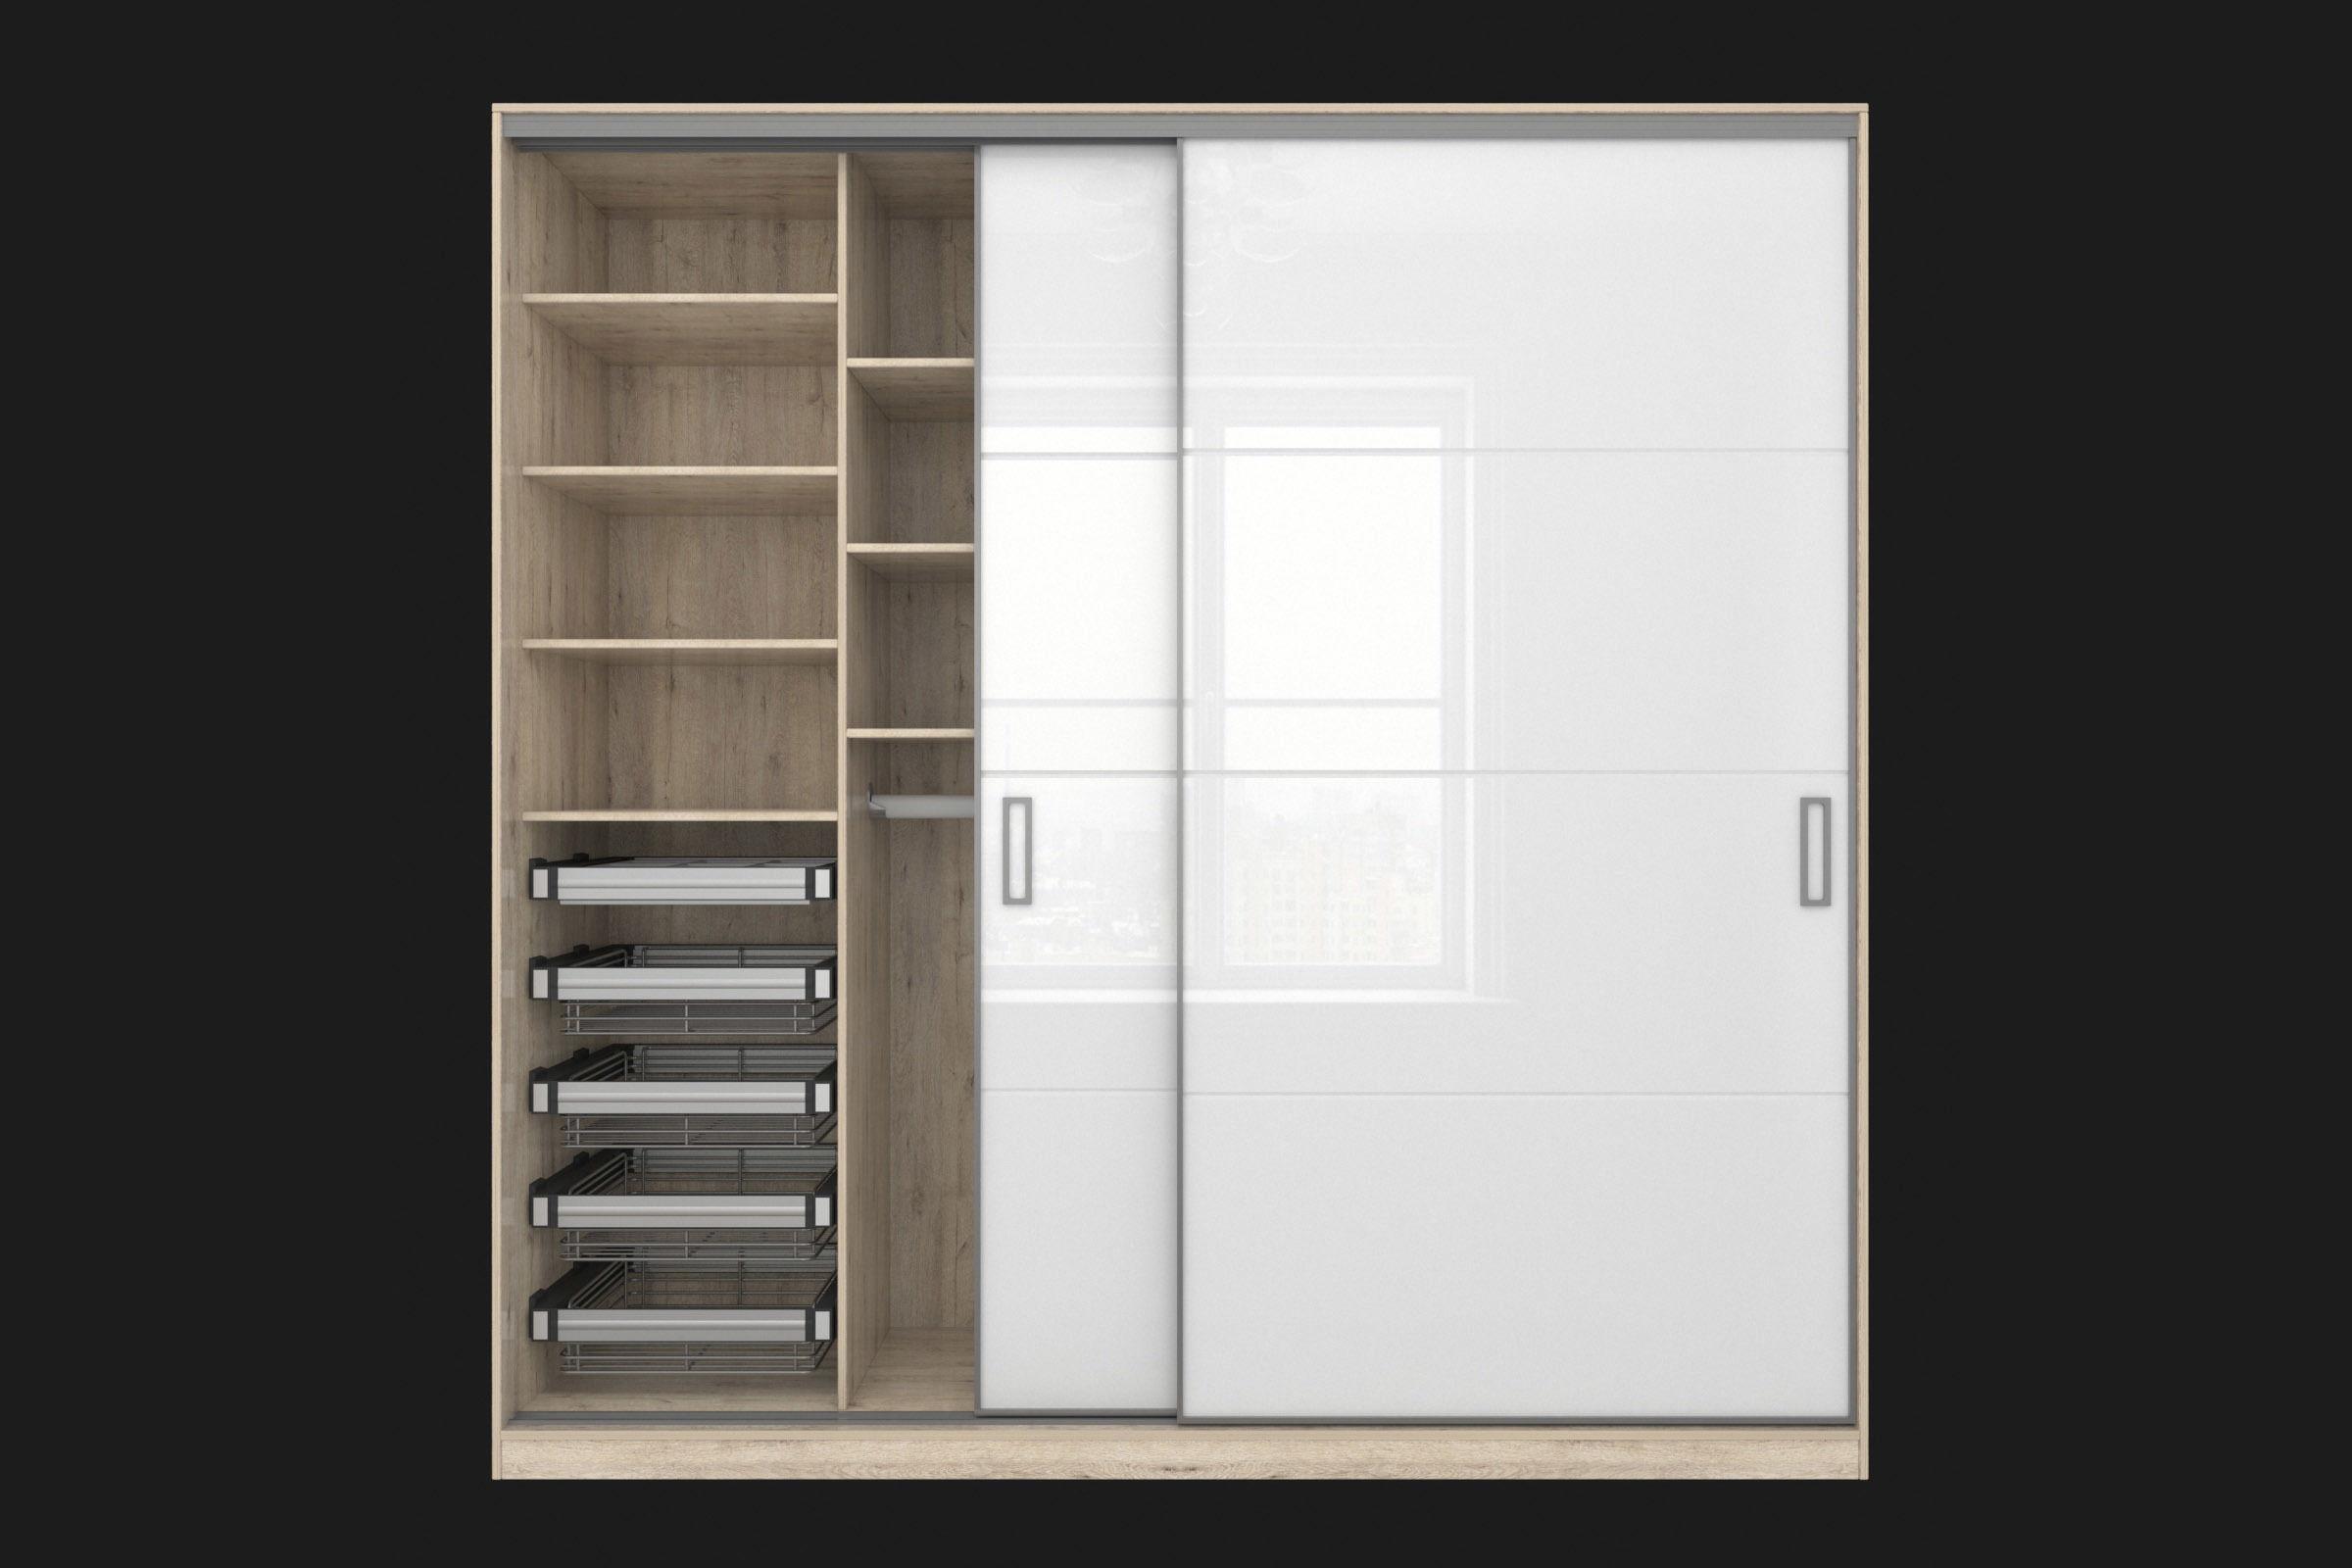 Sliding wardrobe in a narrow Modus MS163 profile